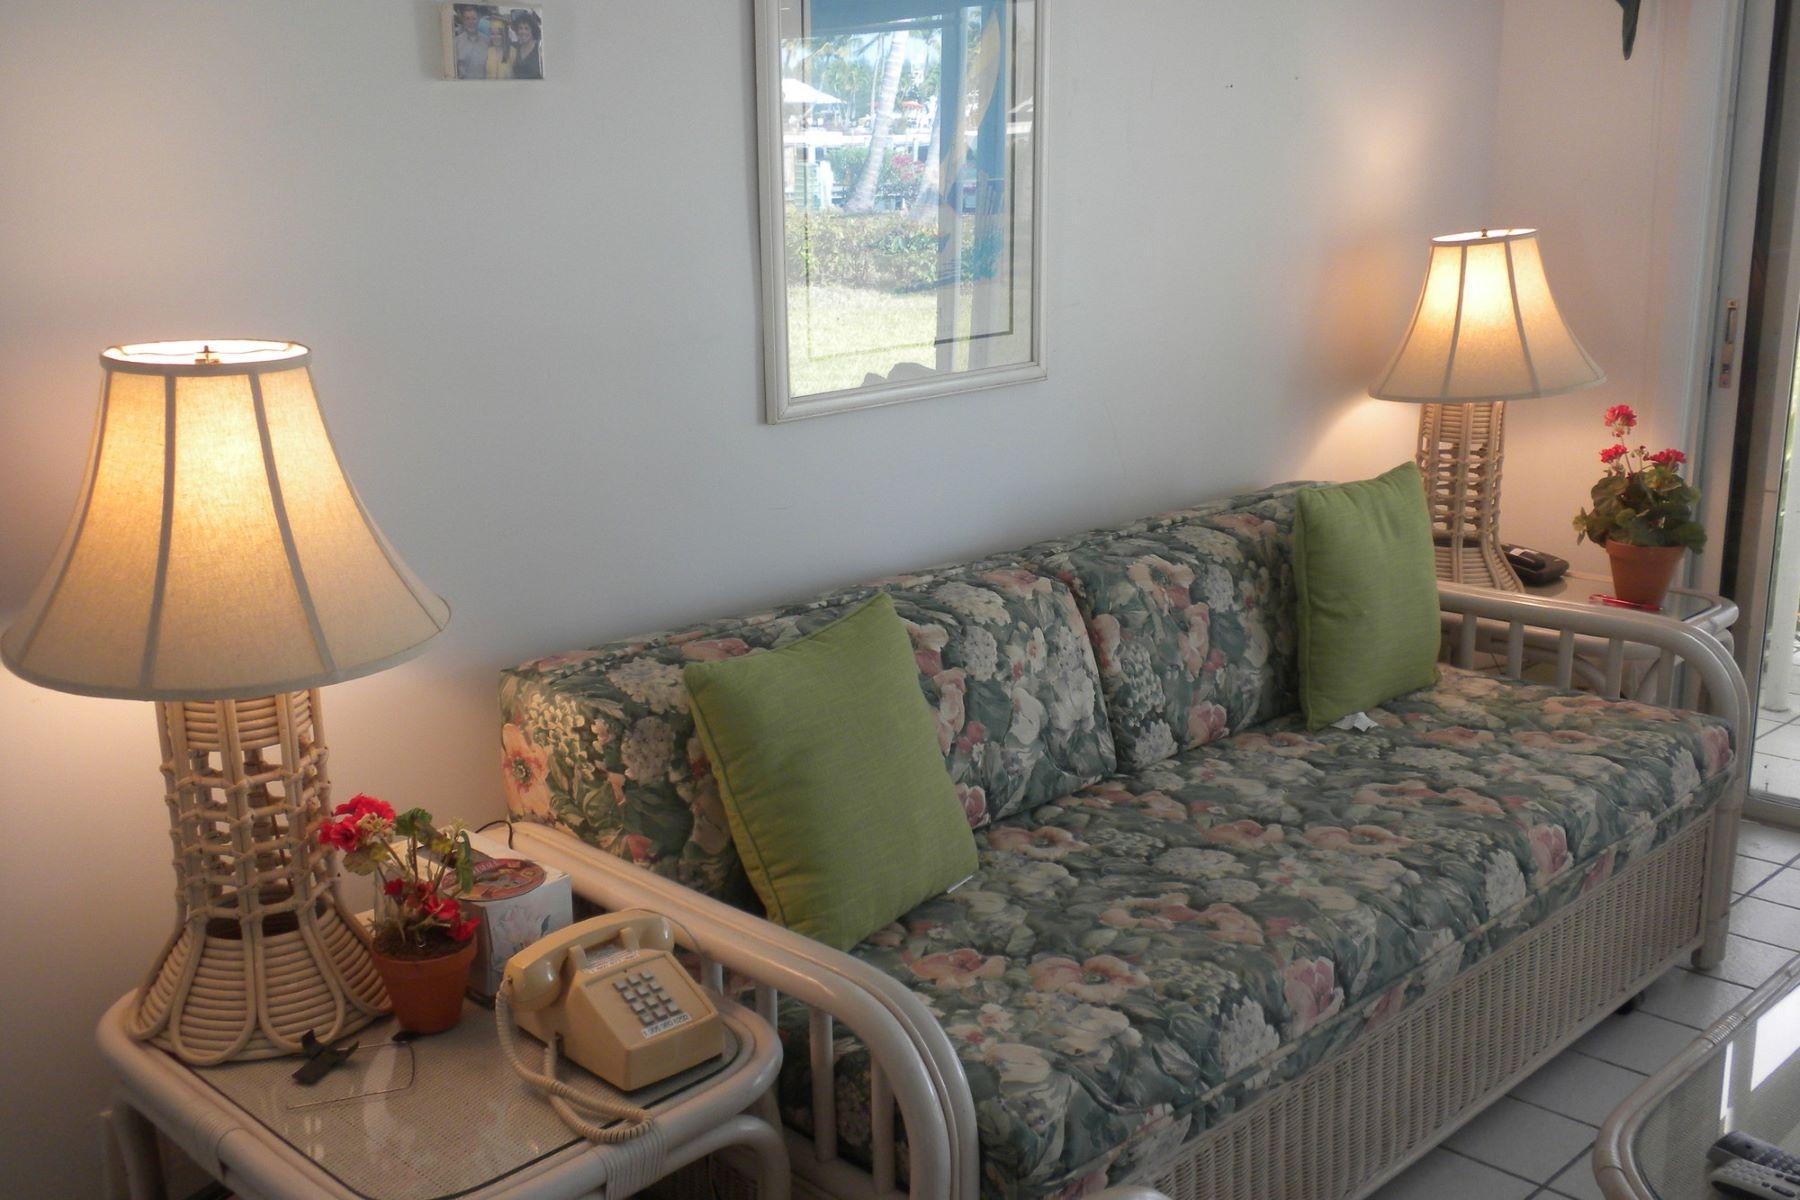 Additional photo for property listing at Mariner's Cove 1402 Treasure Cay, Abaco Bahamas